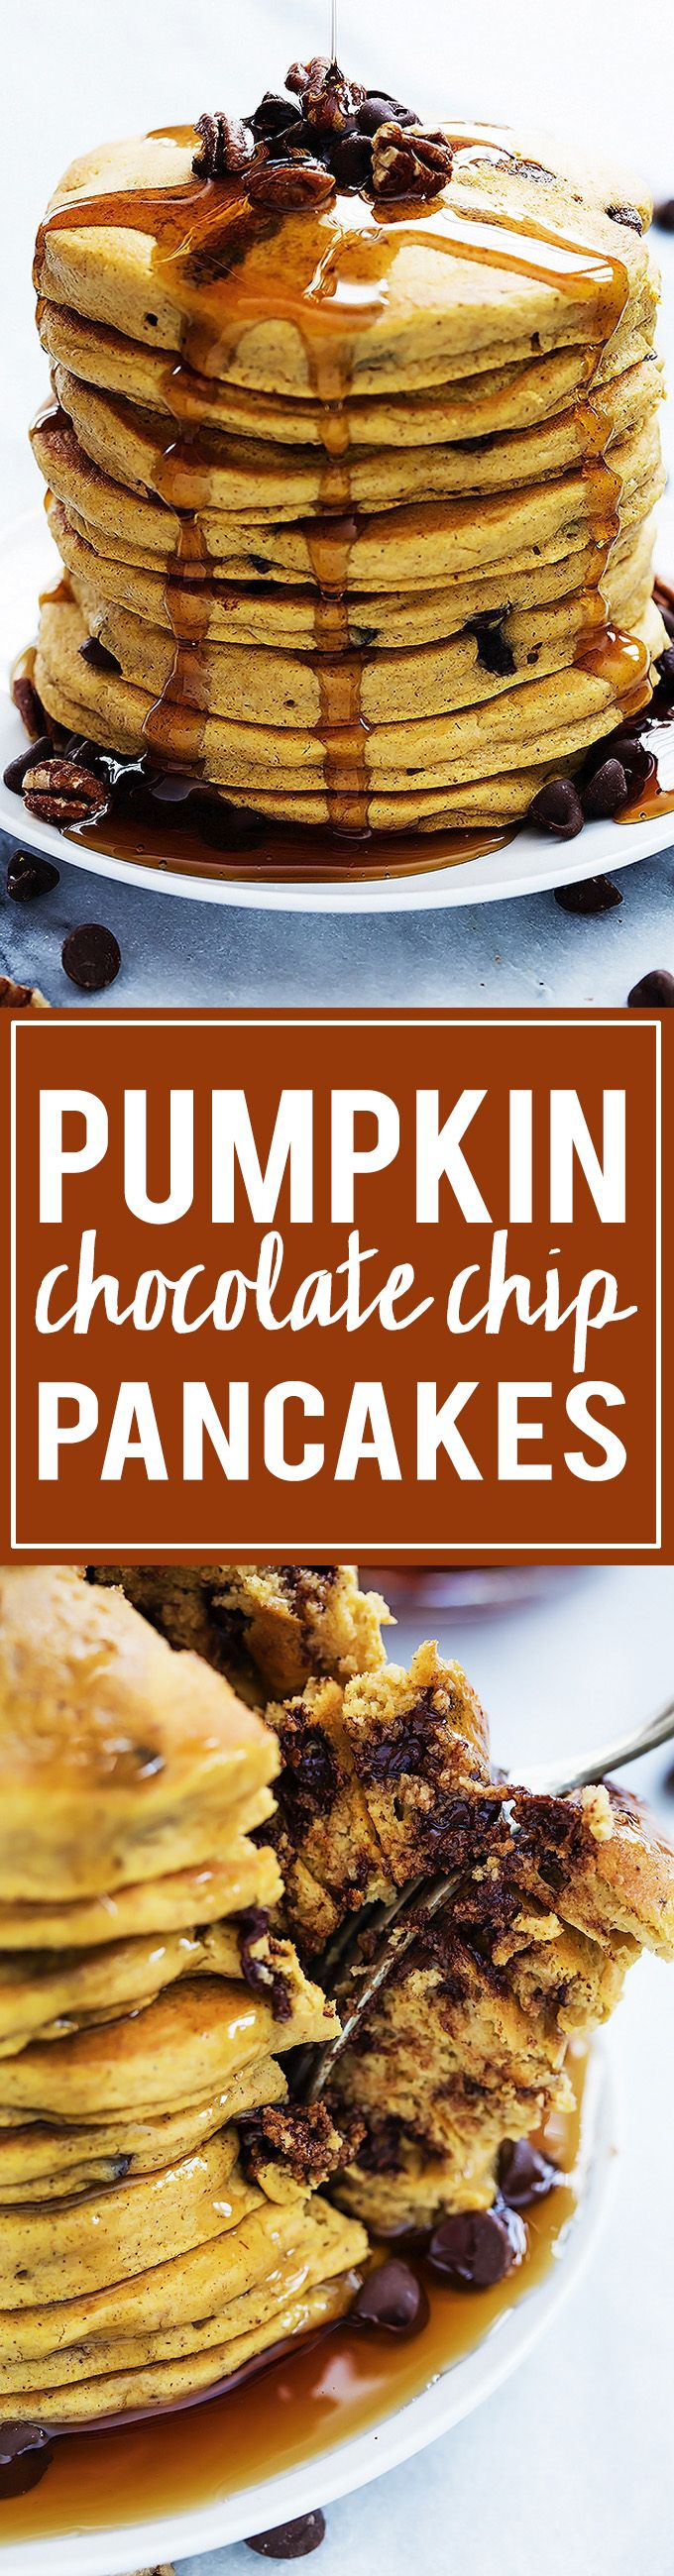 Pumpkin Chocolate Chip Pancakes!